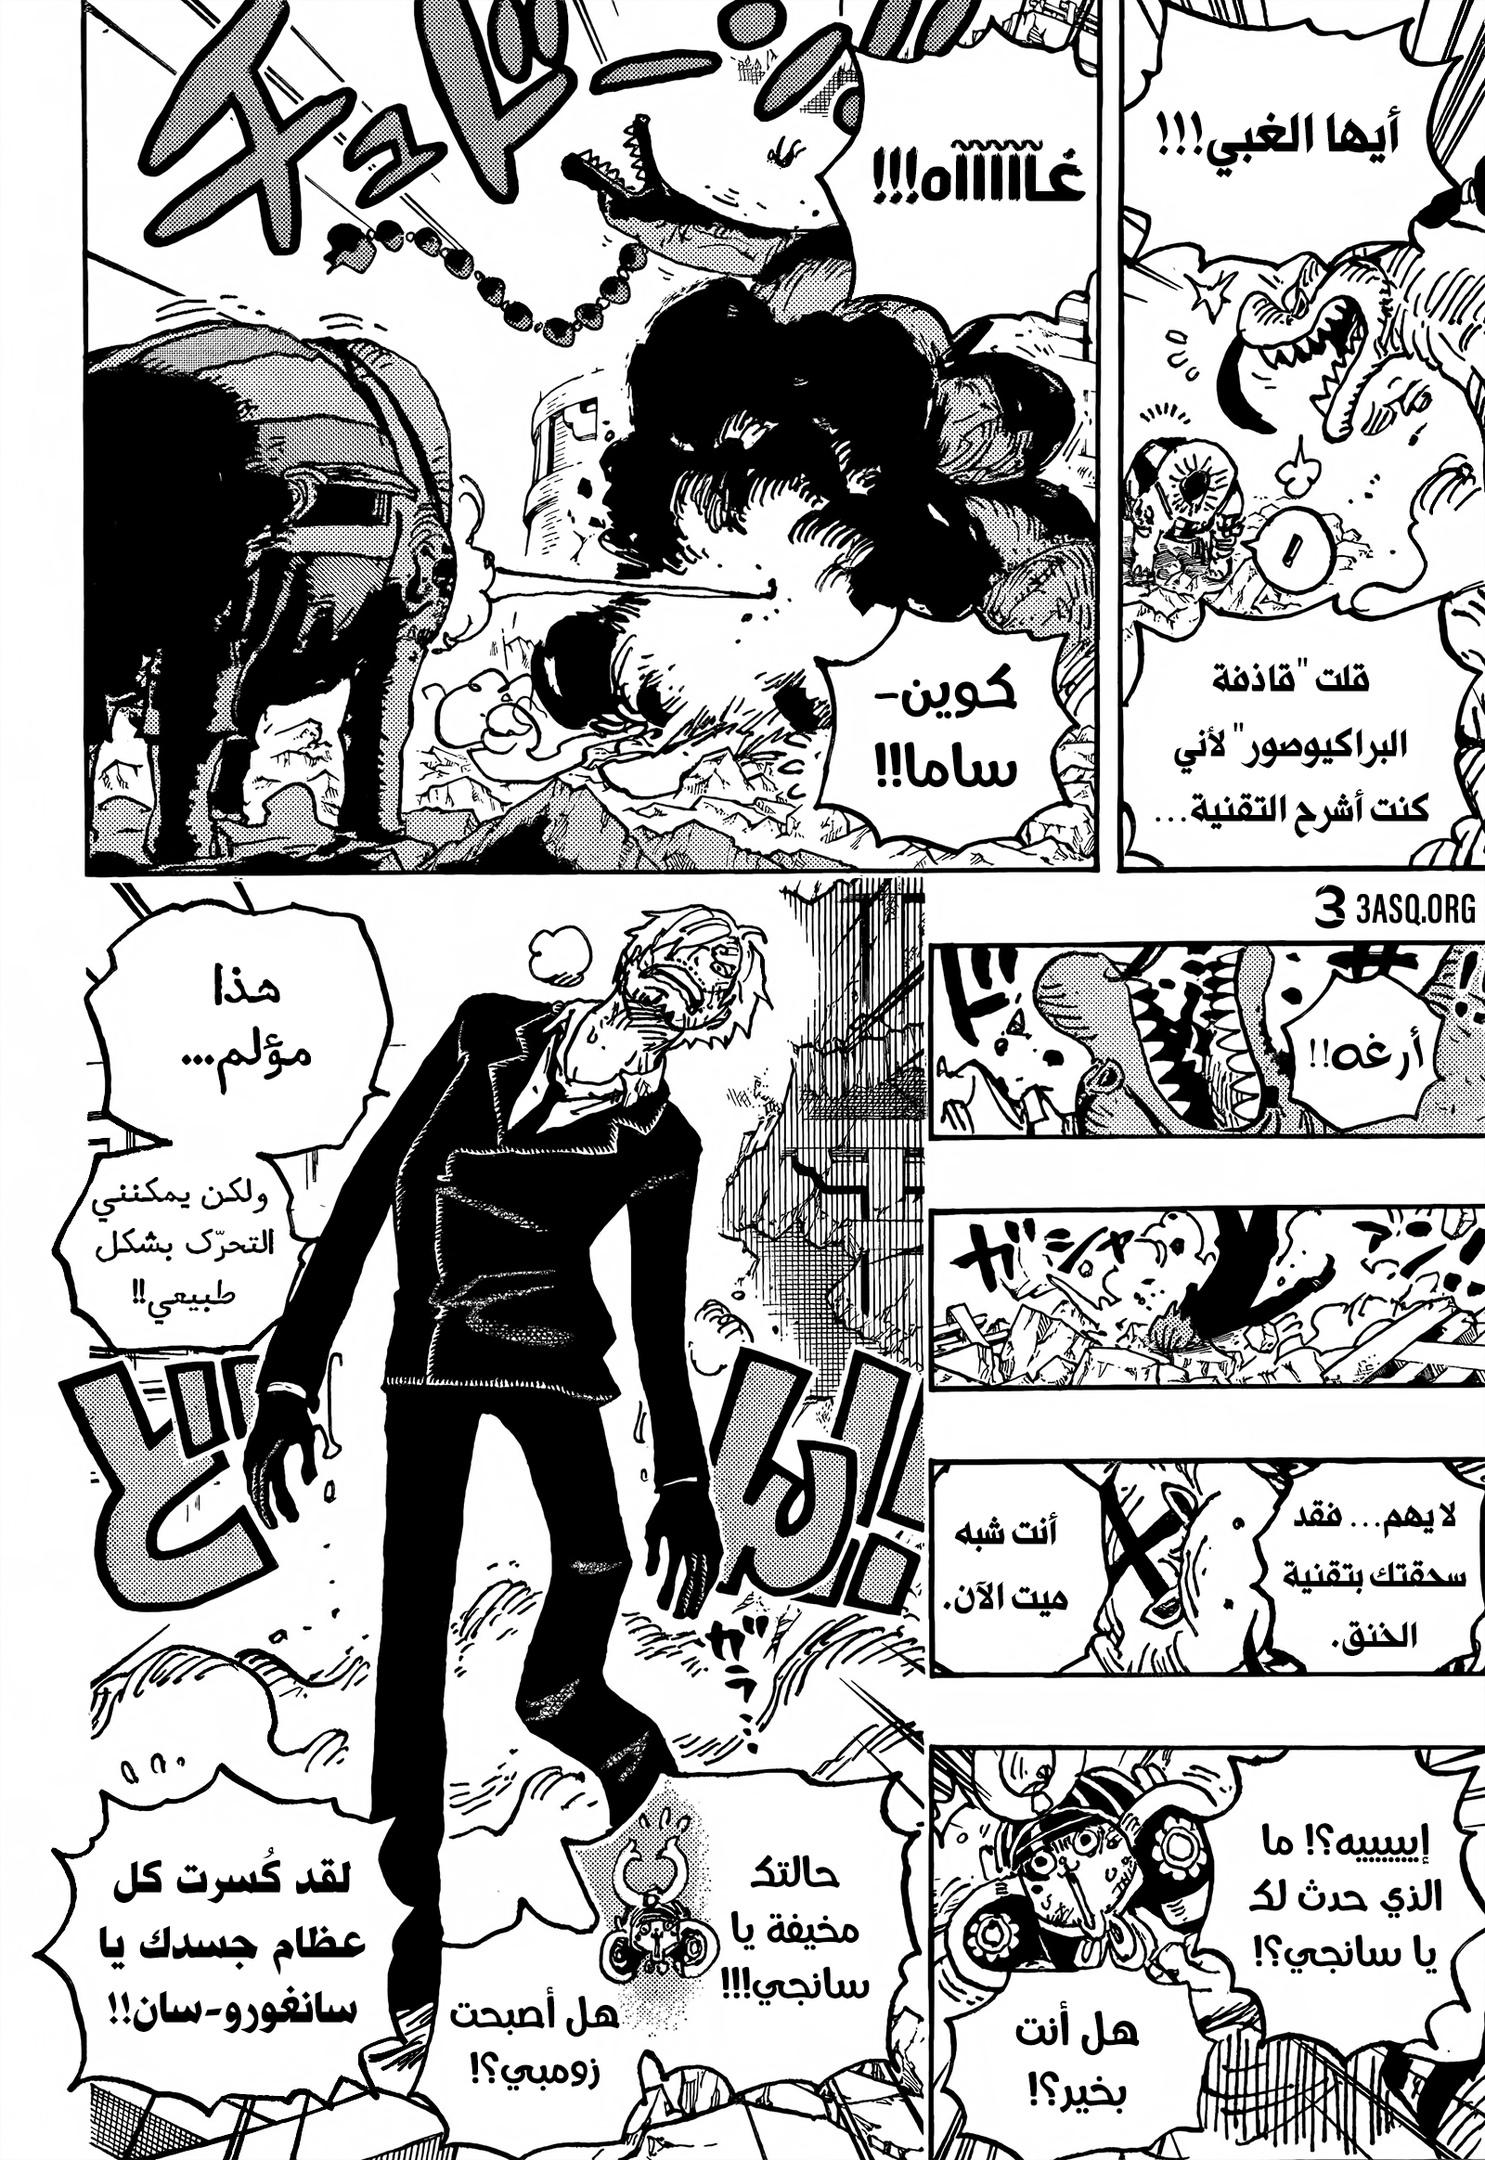 Arab One Piece 1028, image №16